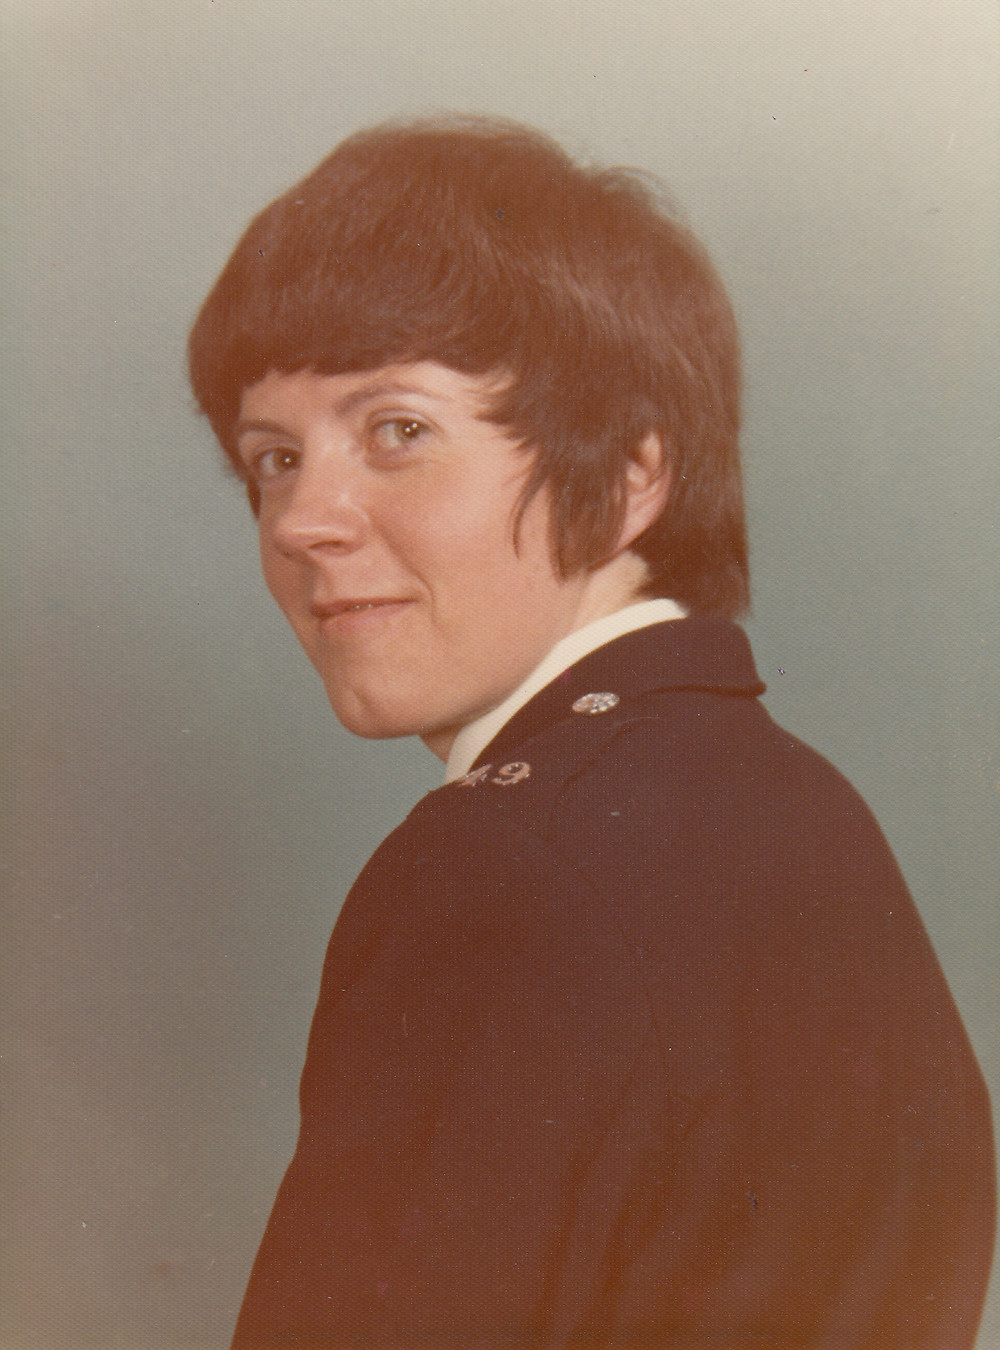 Jean in uniform, collar number 49 is visible on her shoulder